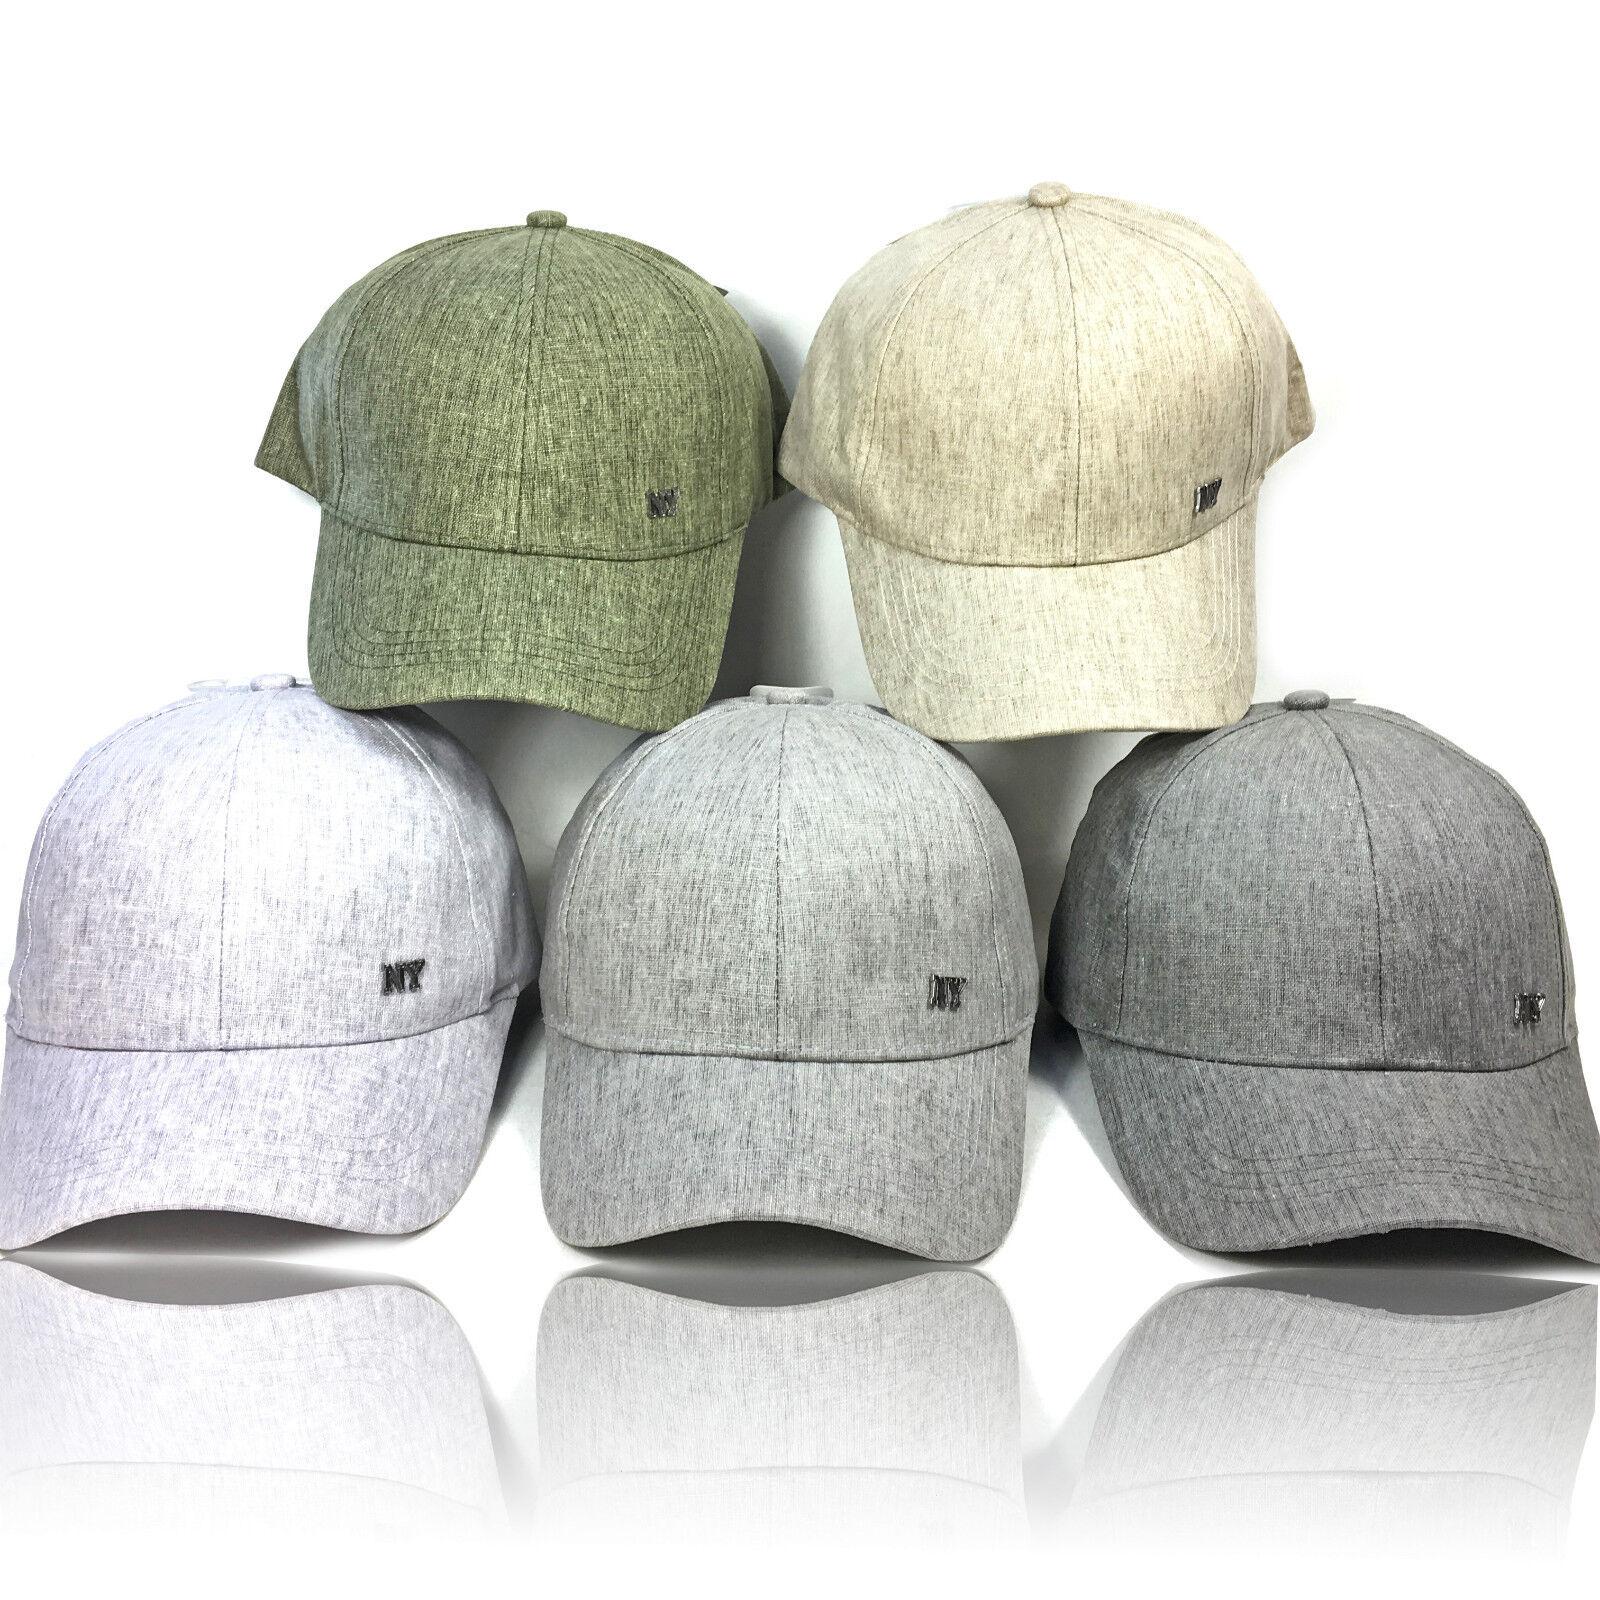 Basecap Baseball Cap NY Flatcap Caps Kappe curved gebogener Schirm TOXIC Sommer